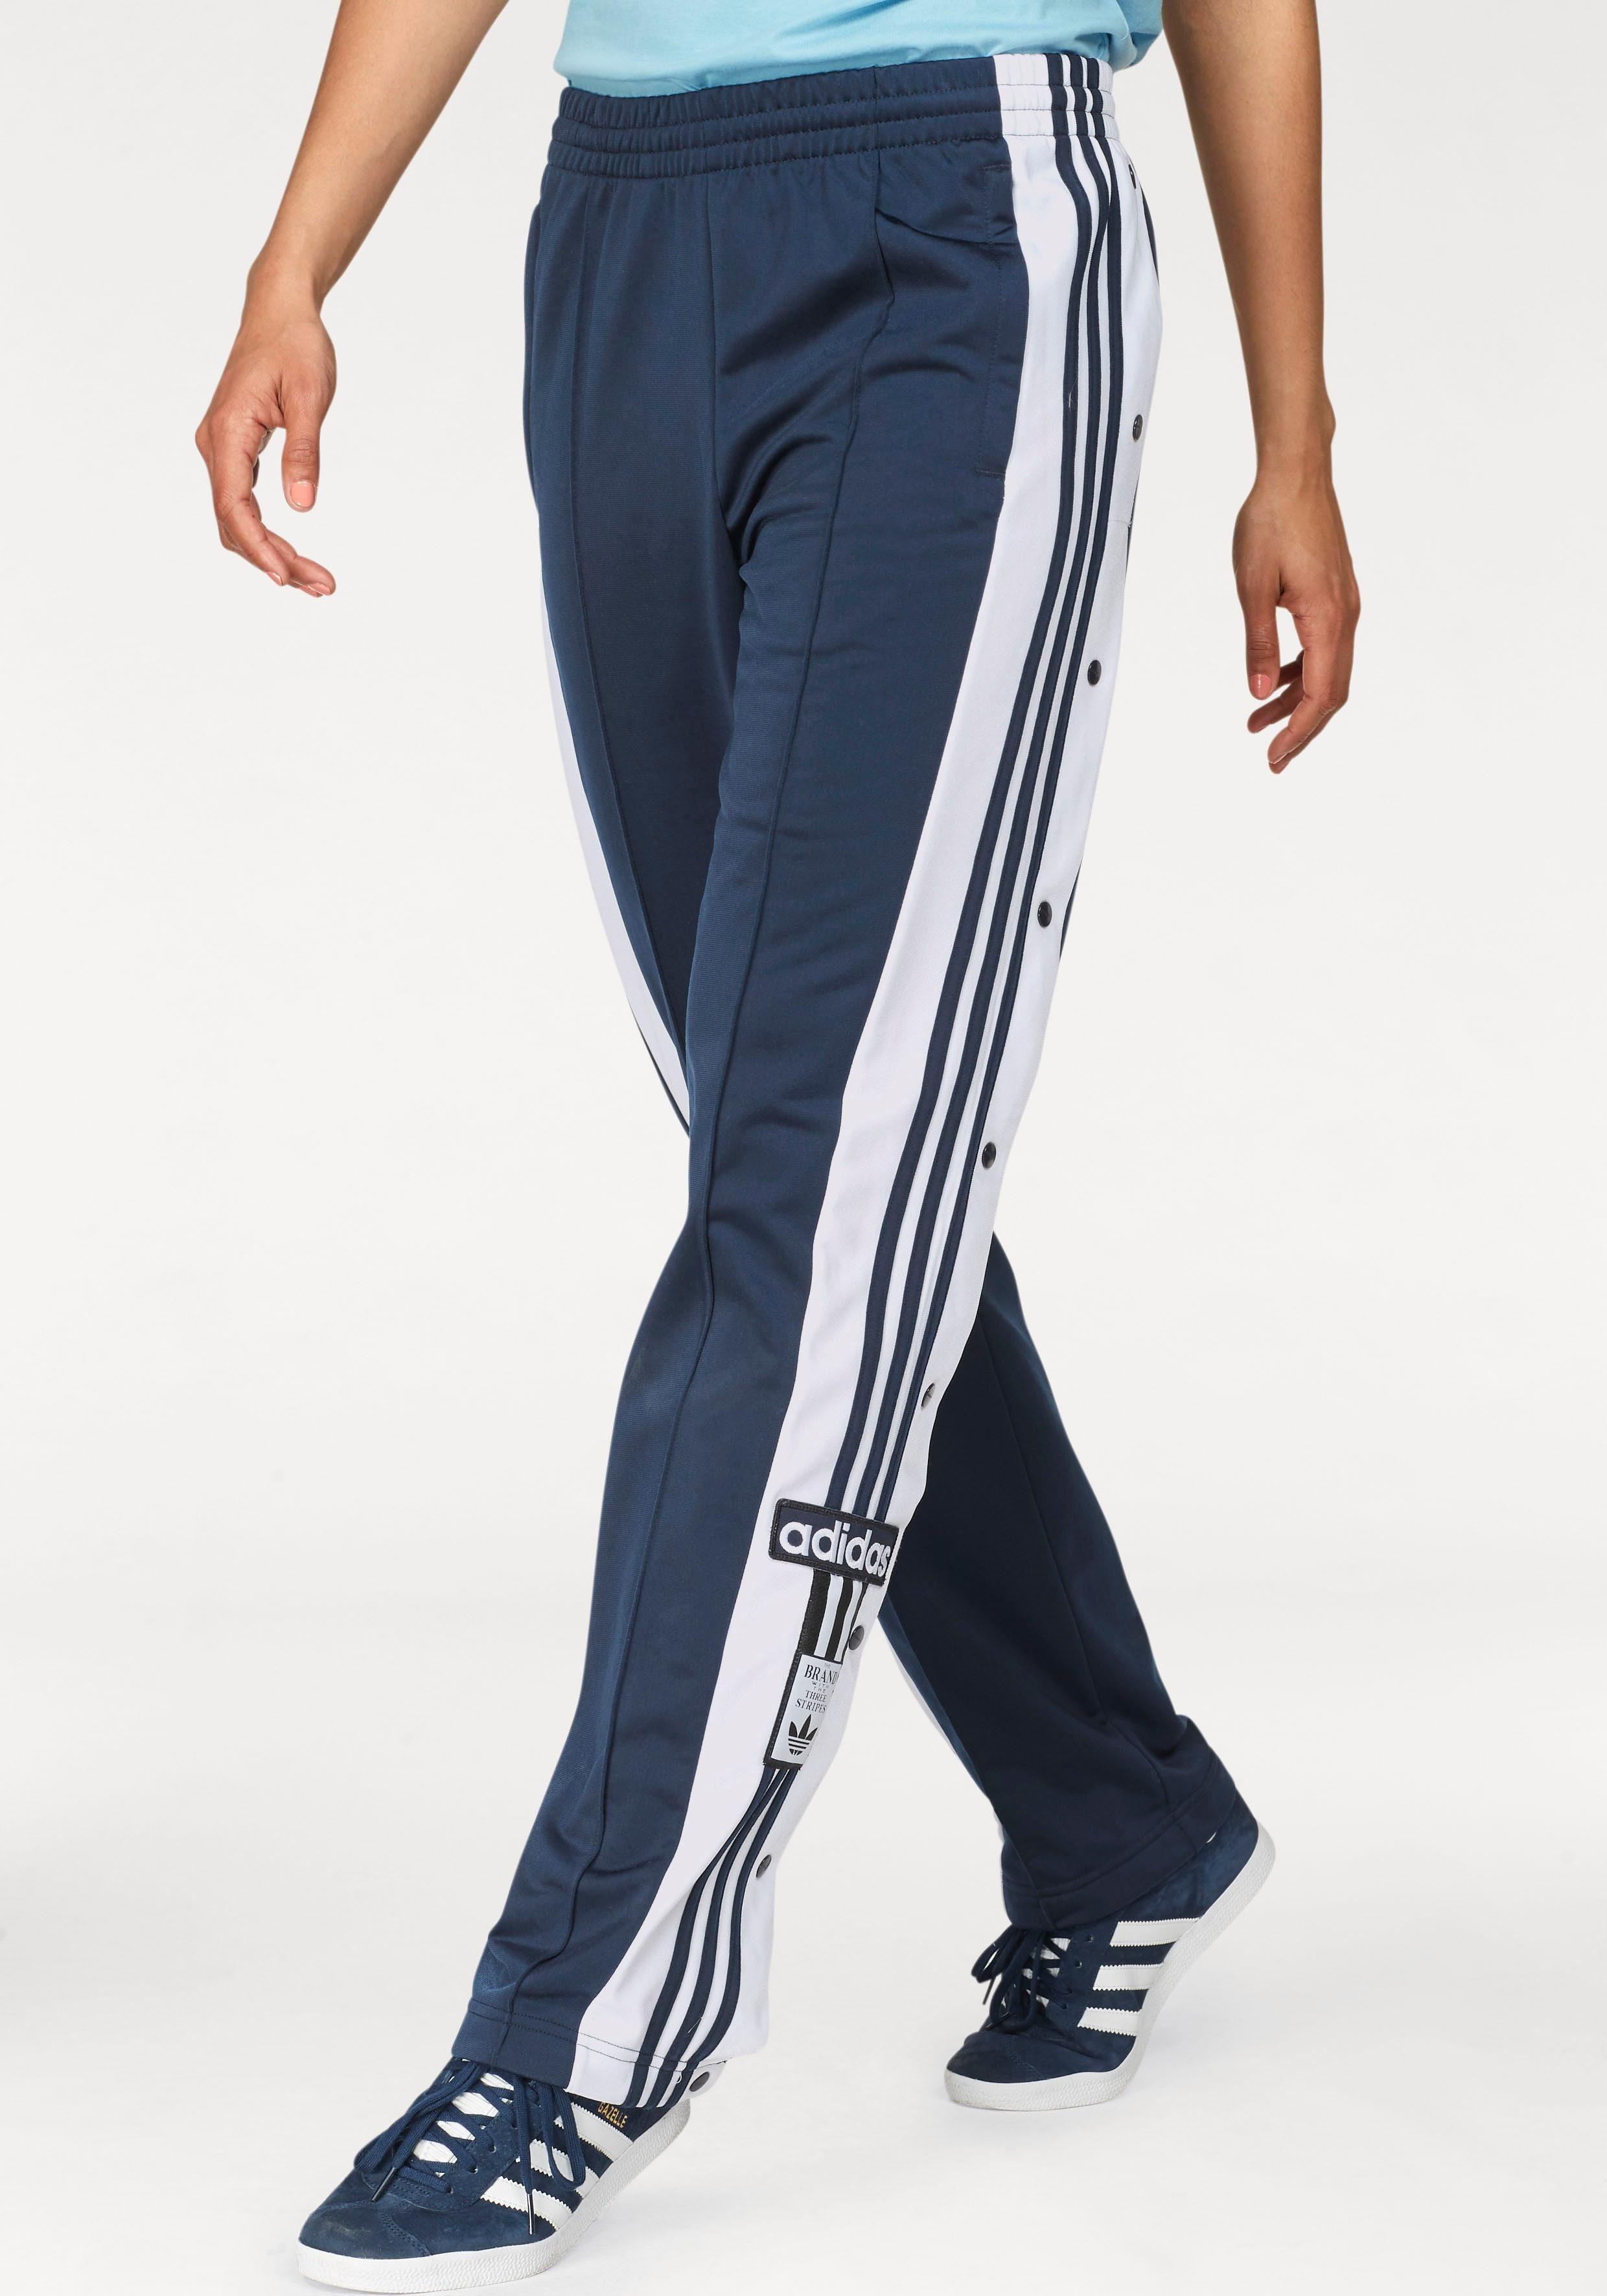 adidas Damen Jogginghose Adibreak